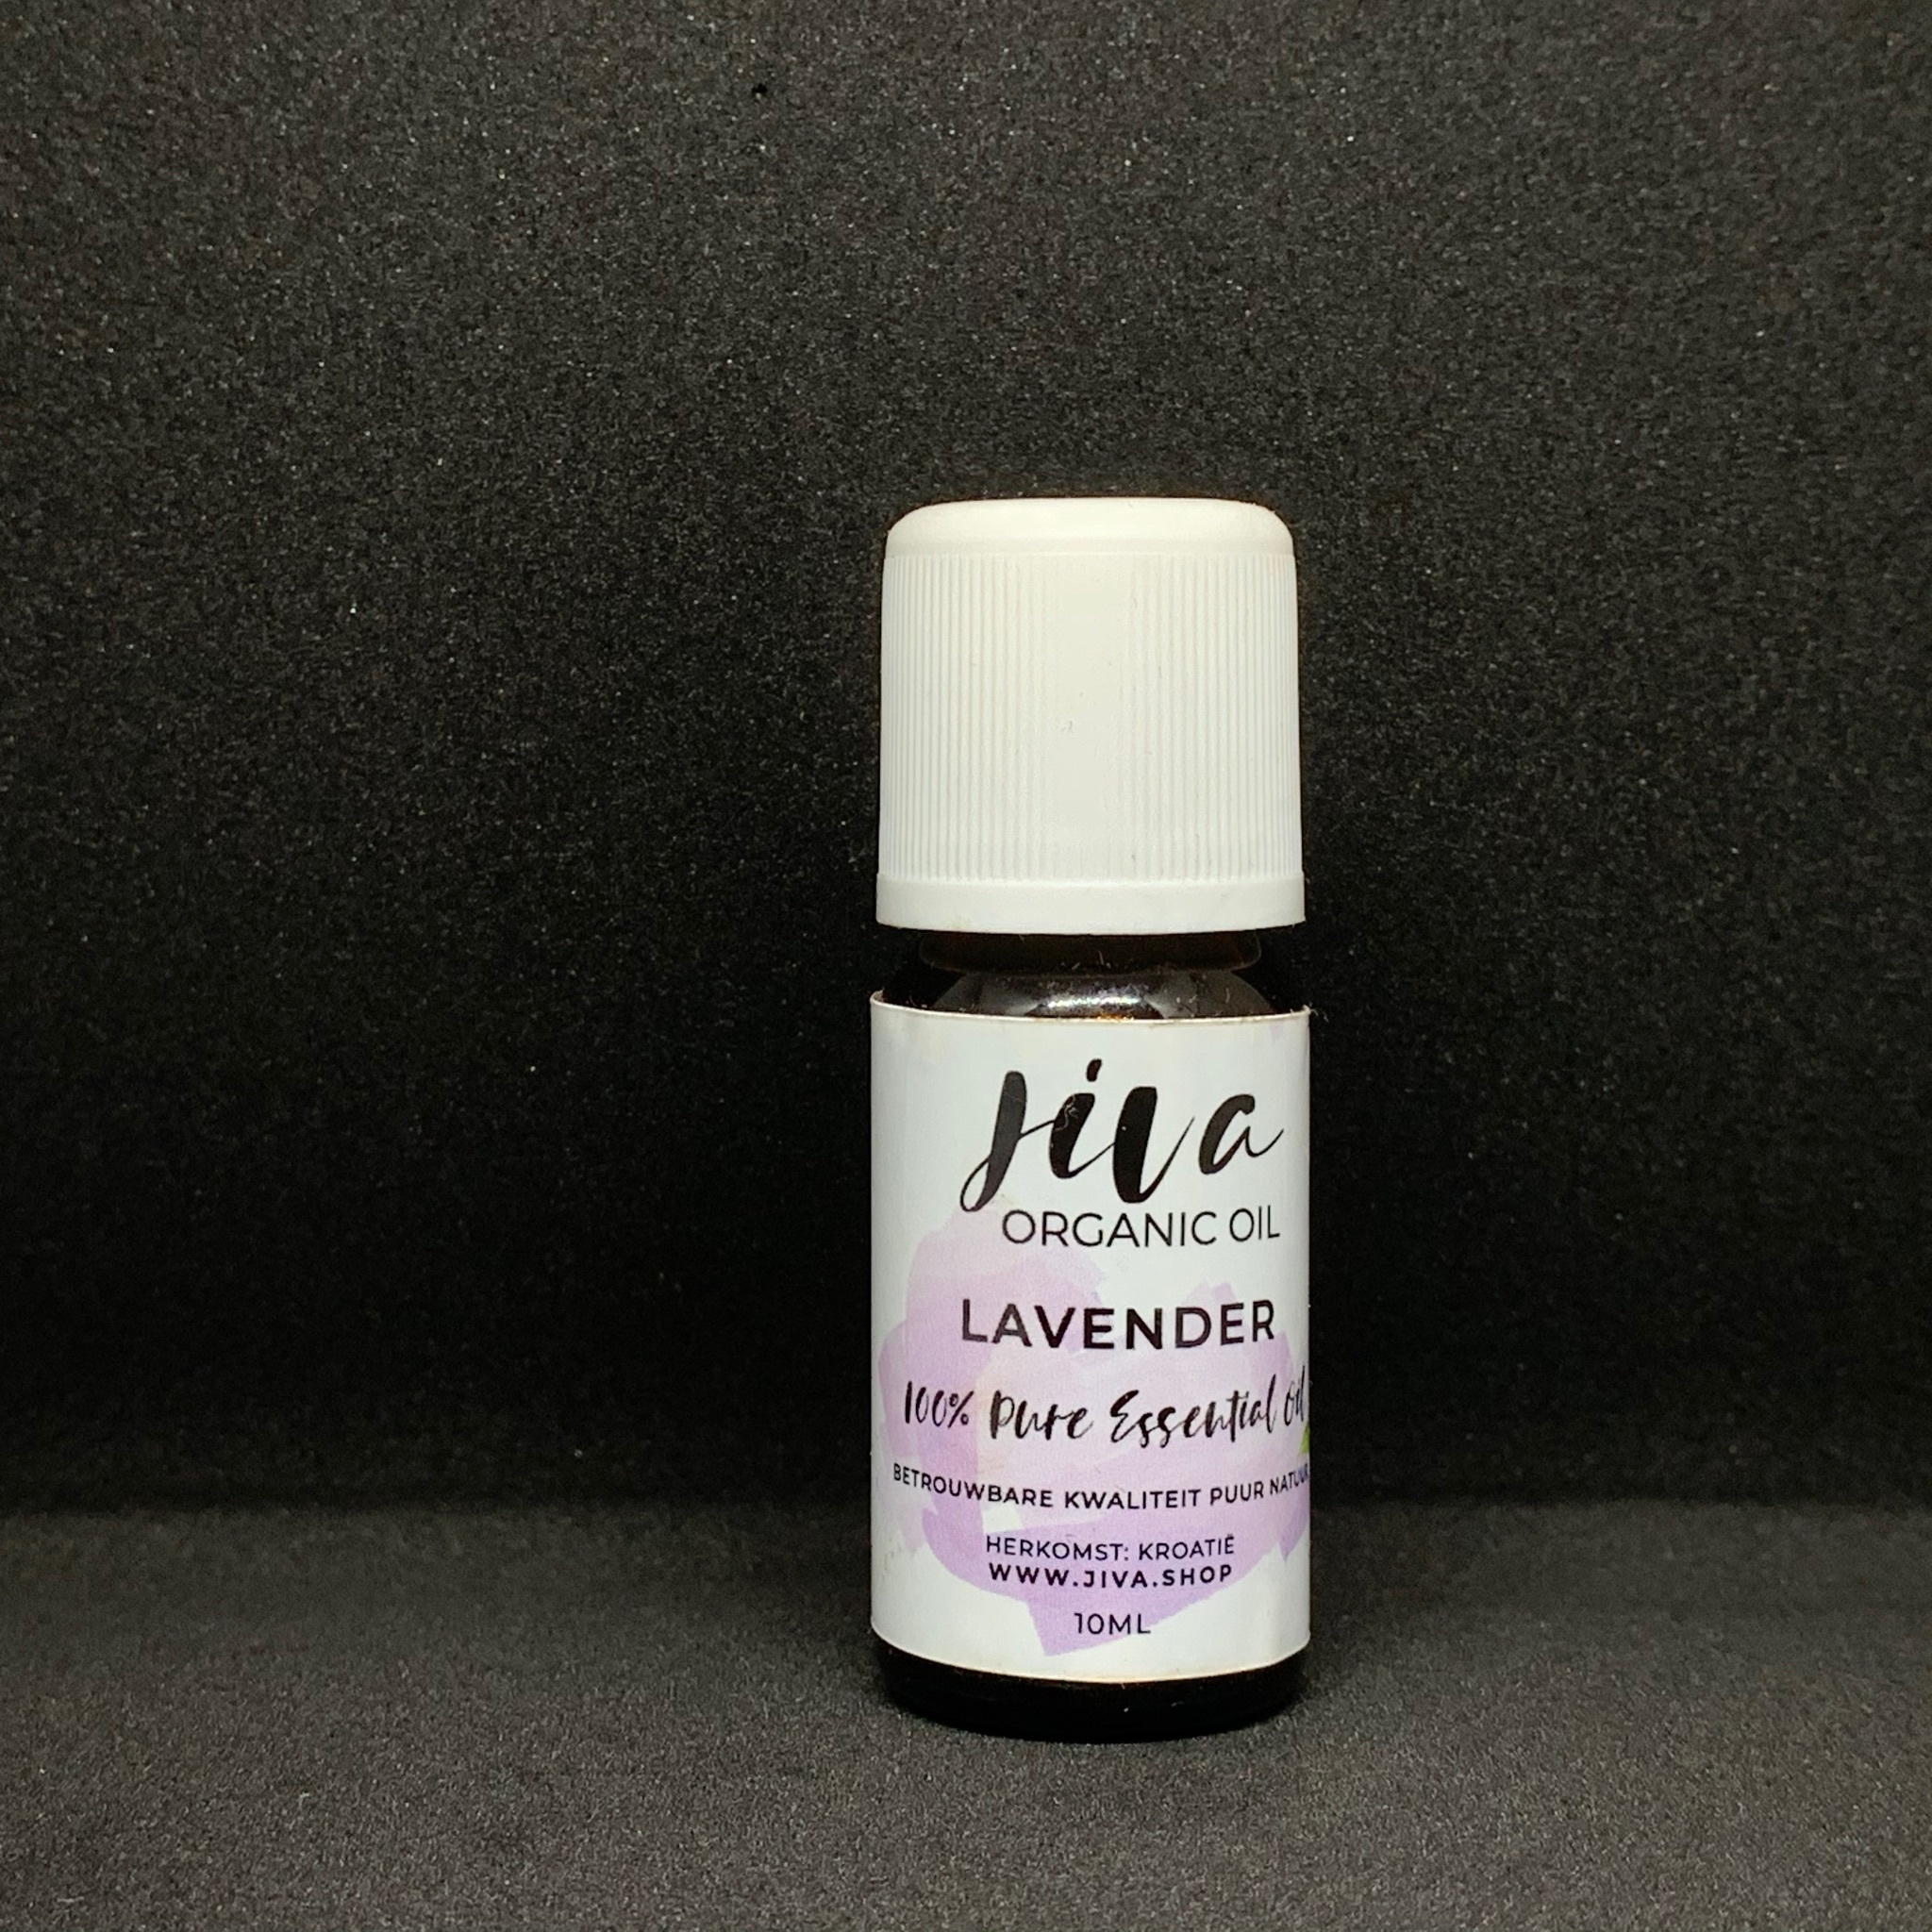 Jiva organic lavender oil